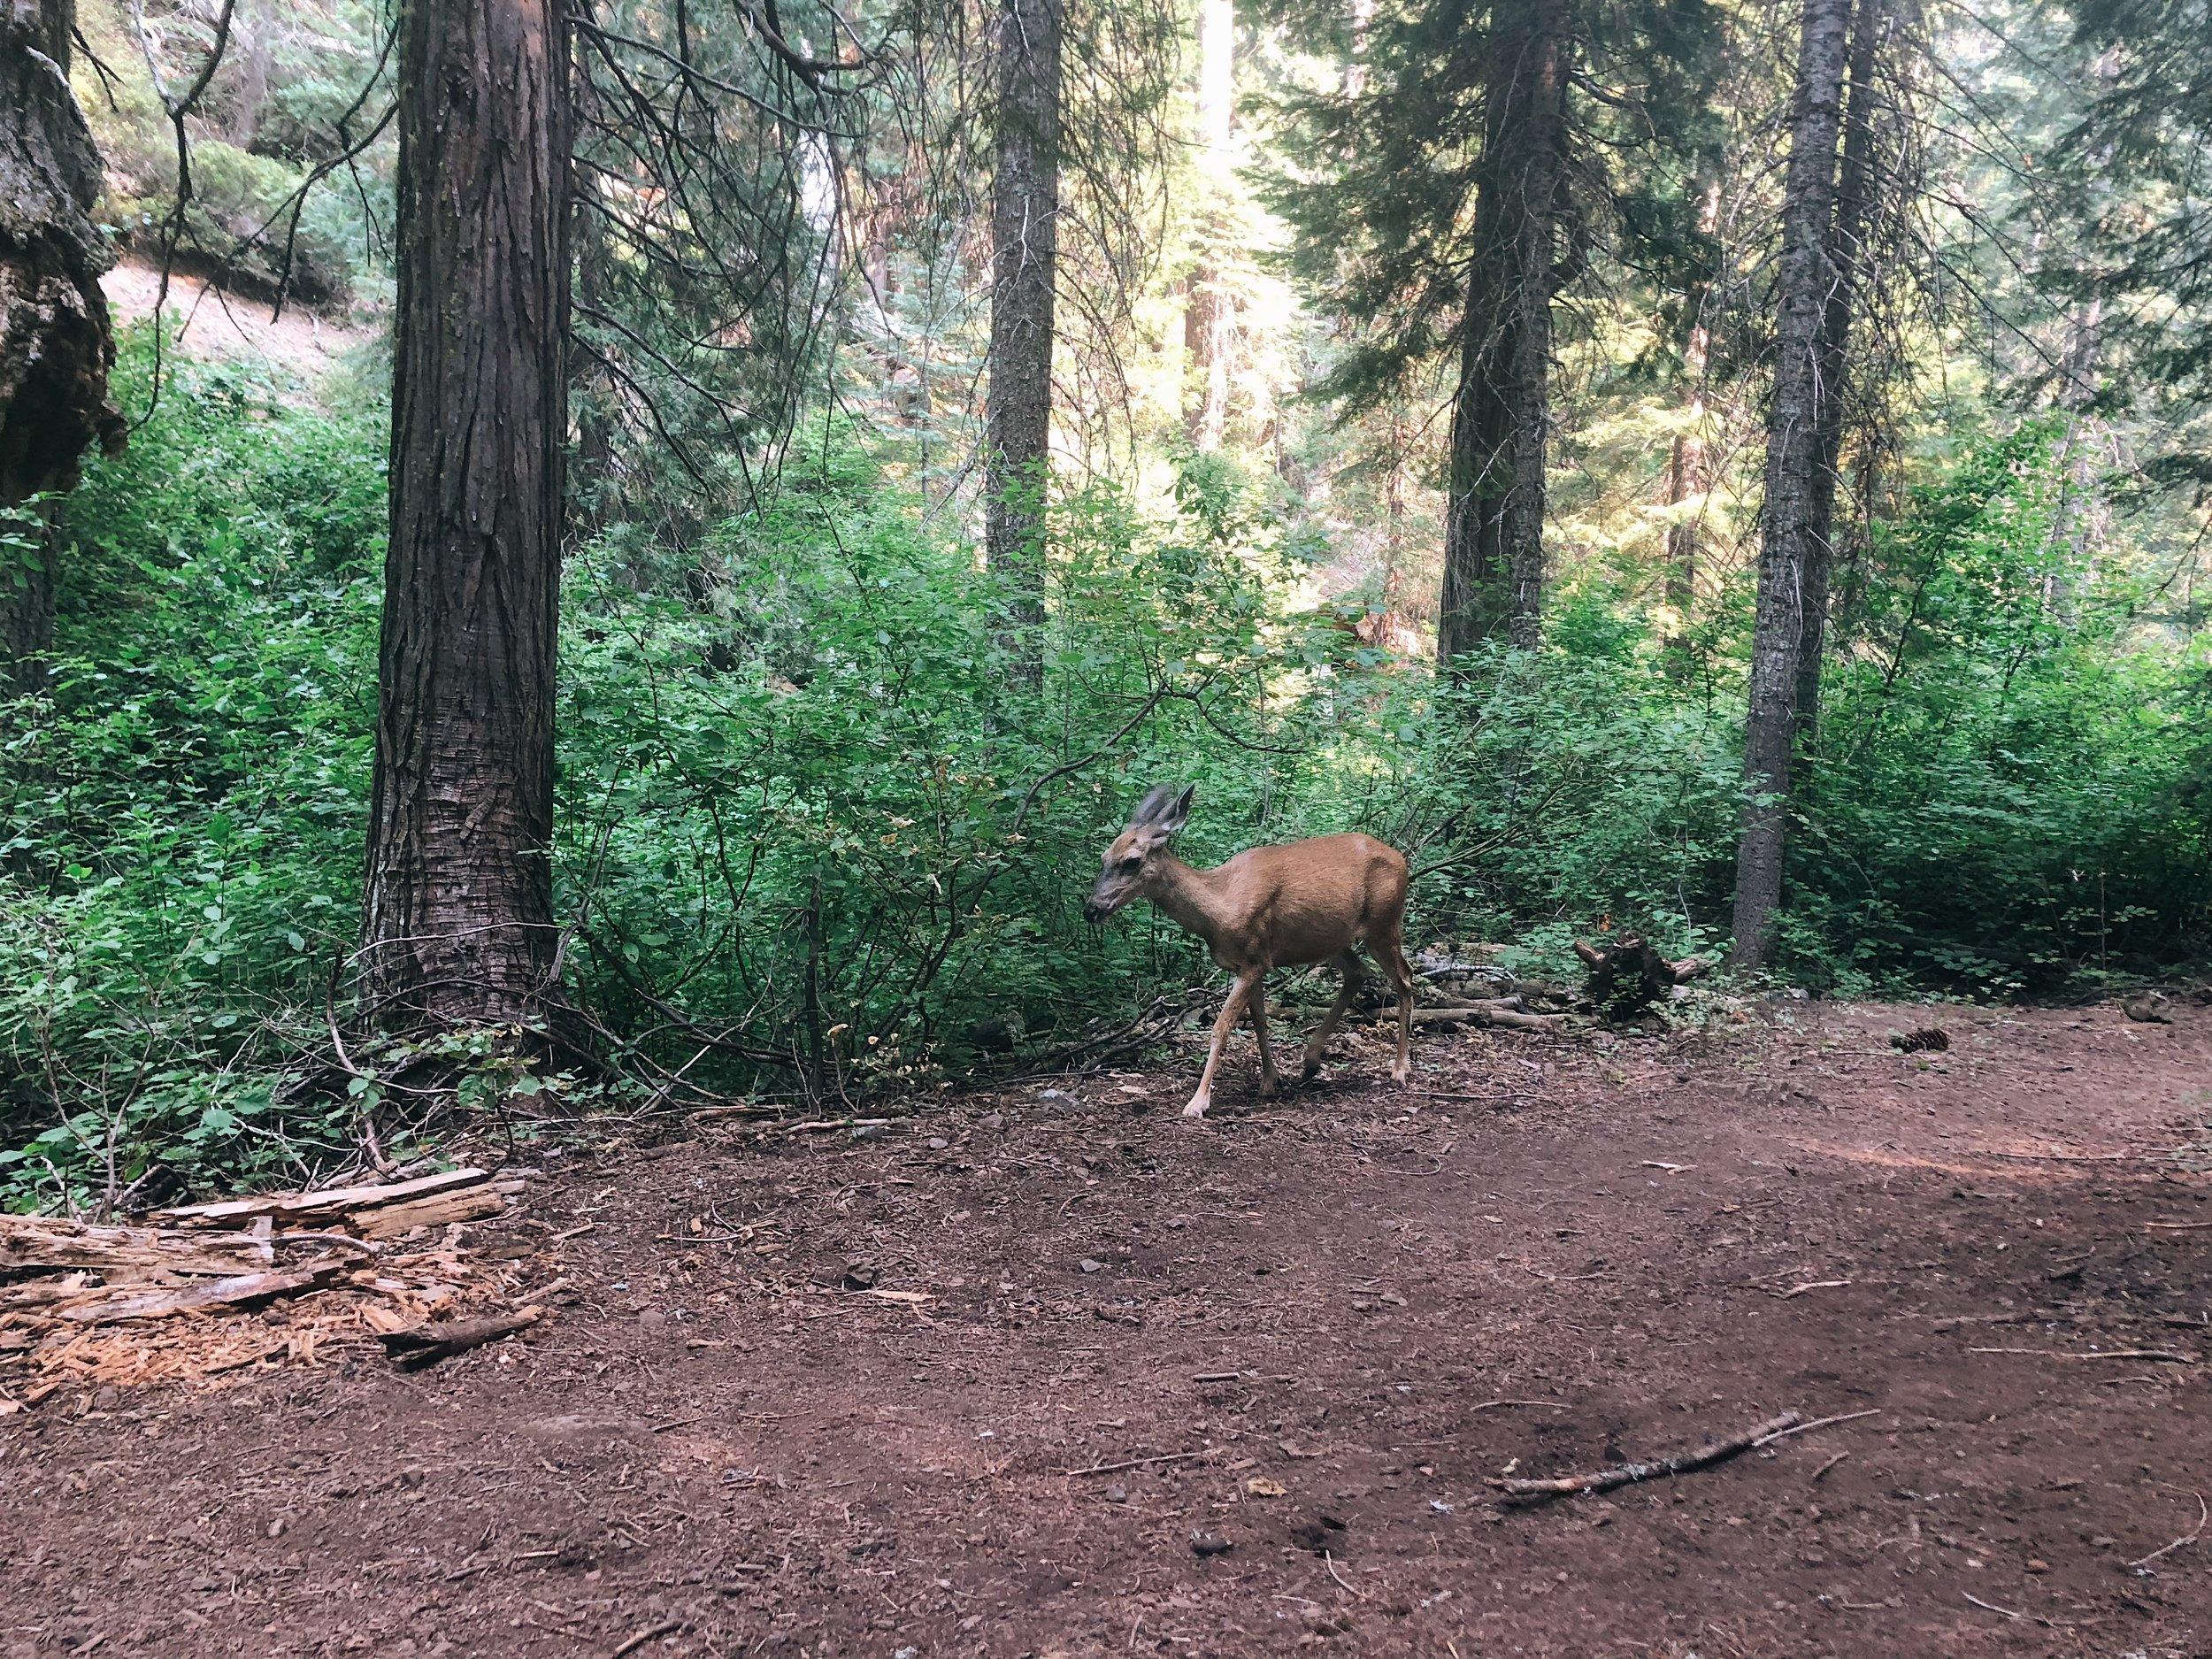 Not the lunch deer, but a different fearless deer